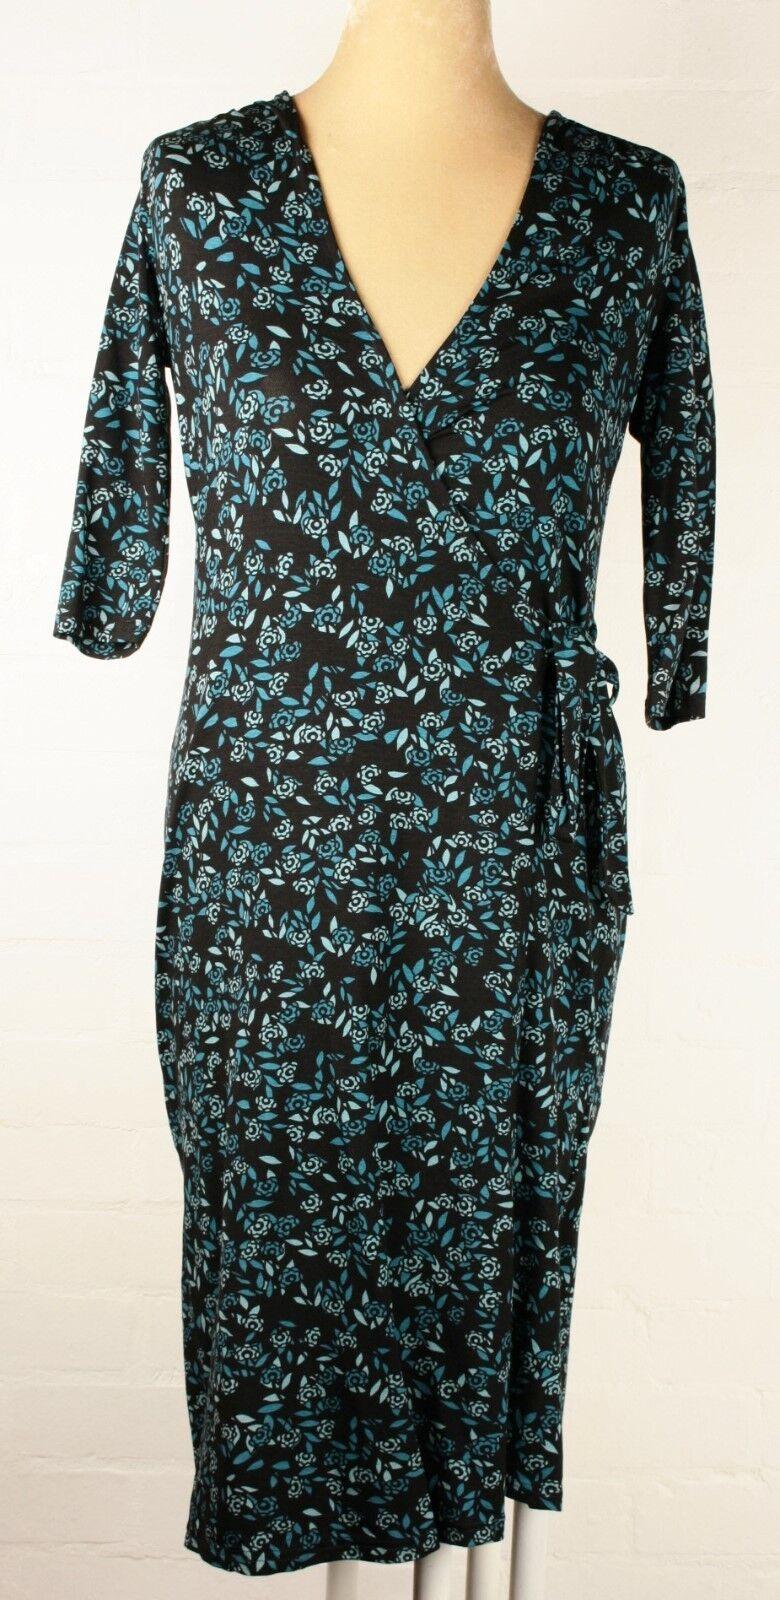 Laura Ashley NWOT Patterned Stretch Stretch Stretch Wrap Dress Sz 12 759cc5